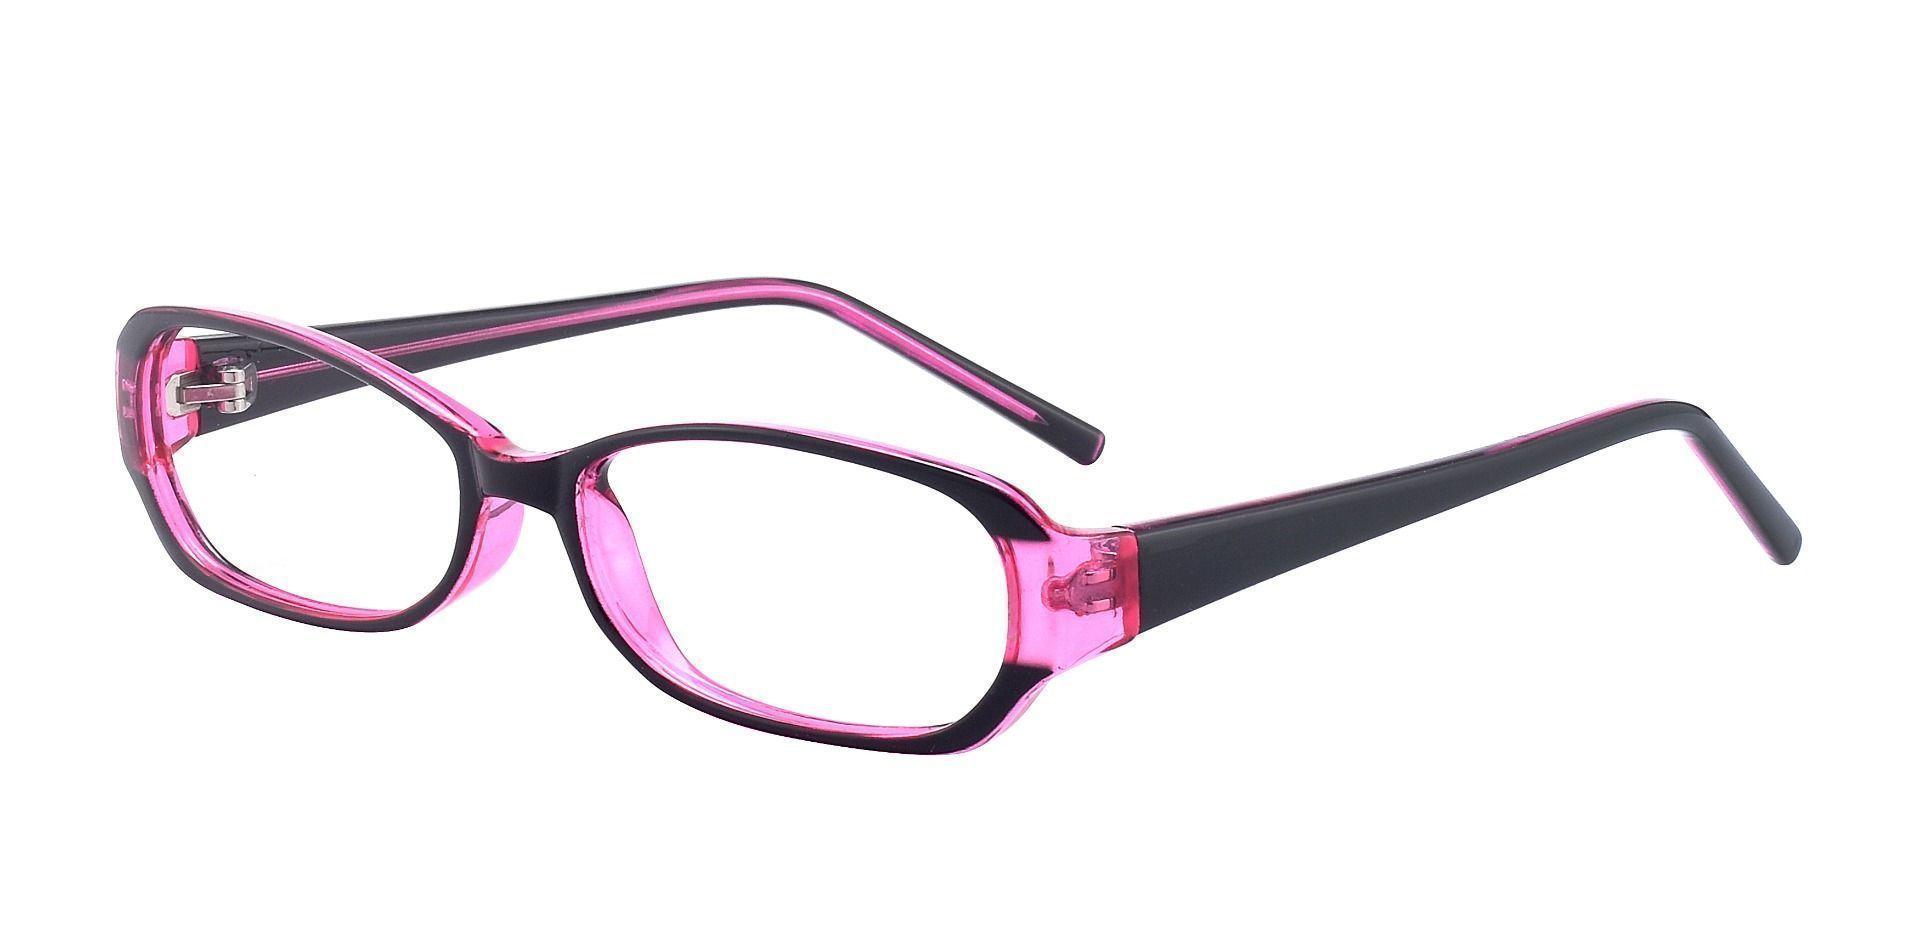 Nairobi Oval Single Vision Glasses - Purple